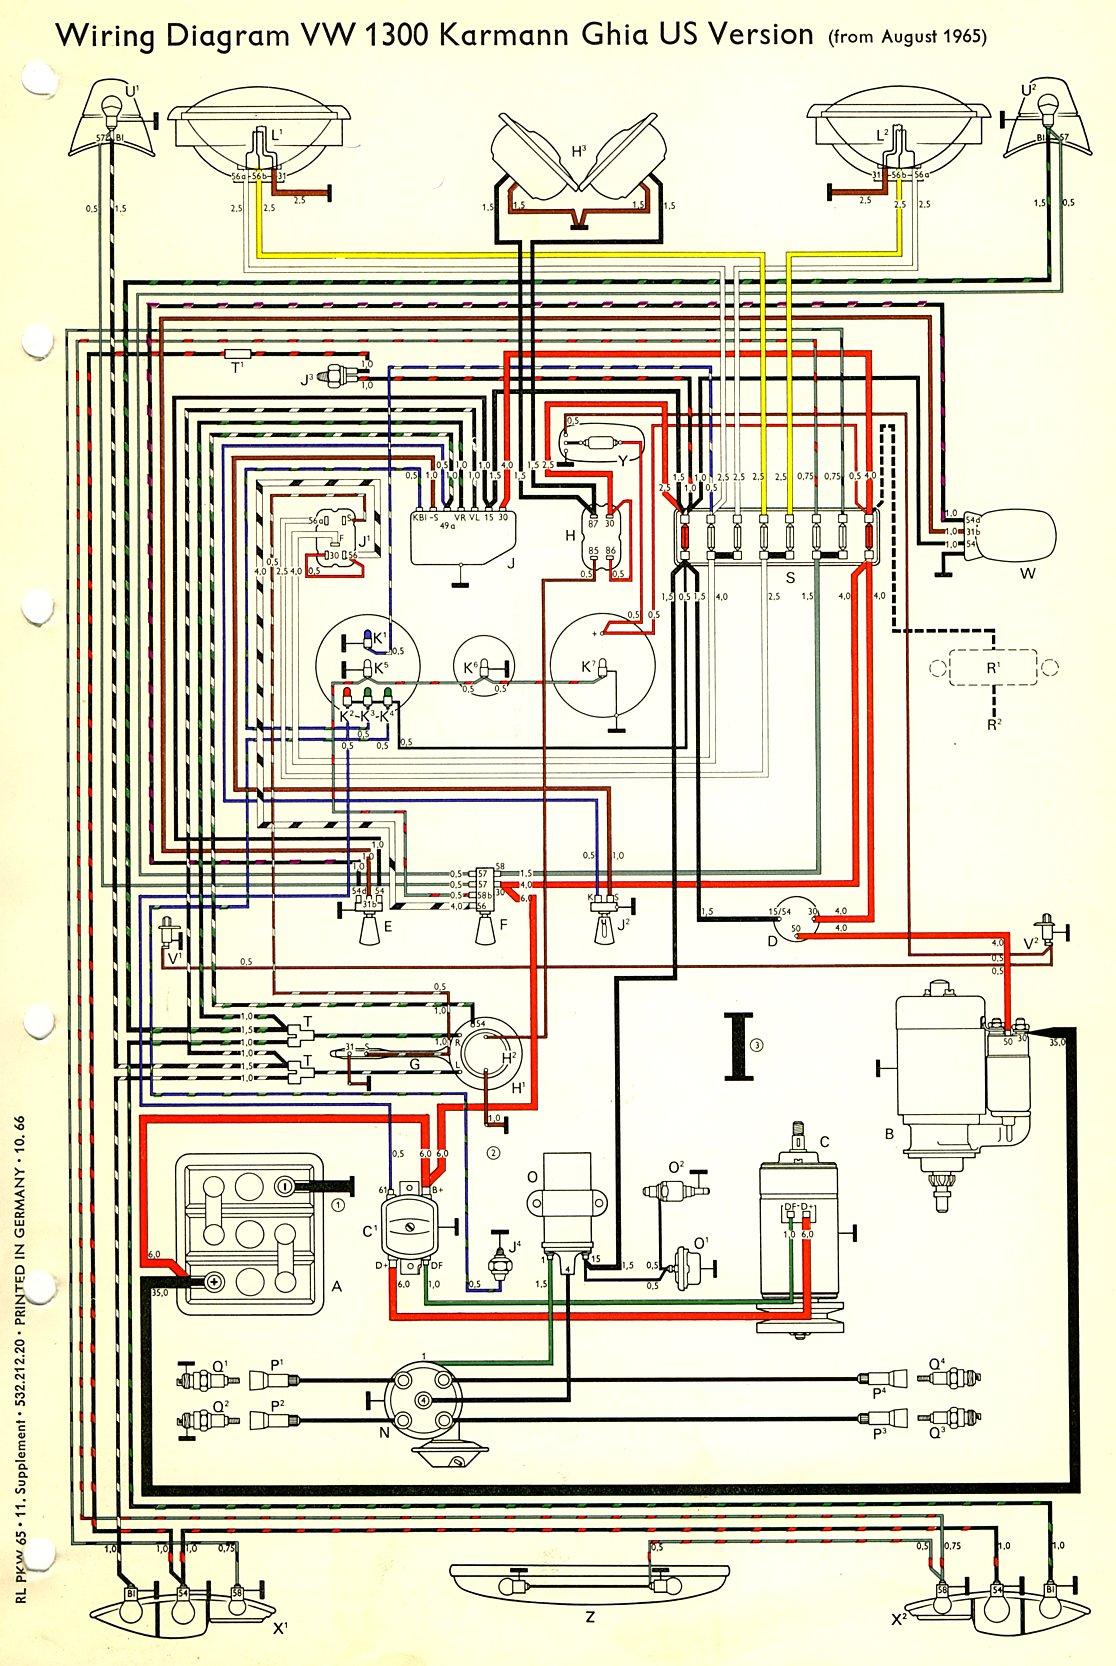 1956 Dodge Truck Wiring Diagrams Thesamba Com Karmann Ghia Wiring Diagrams